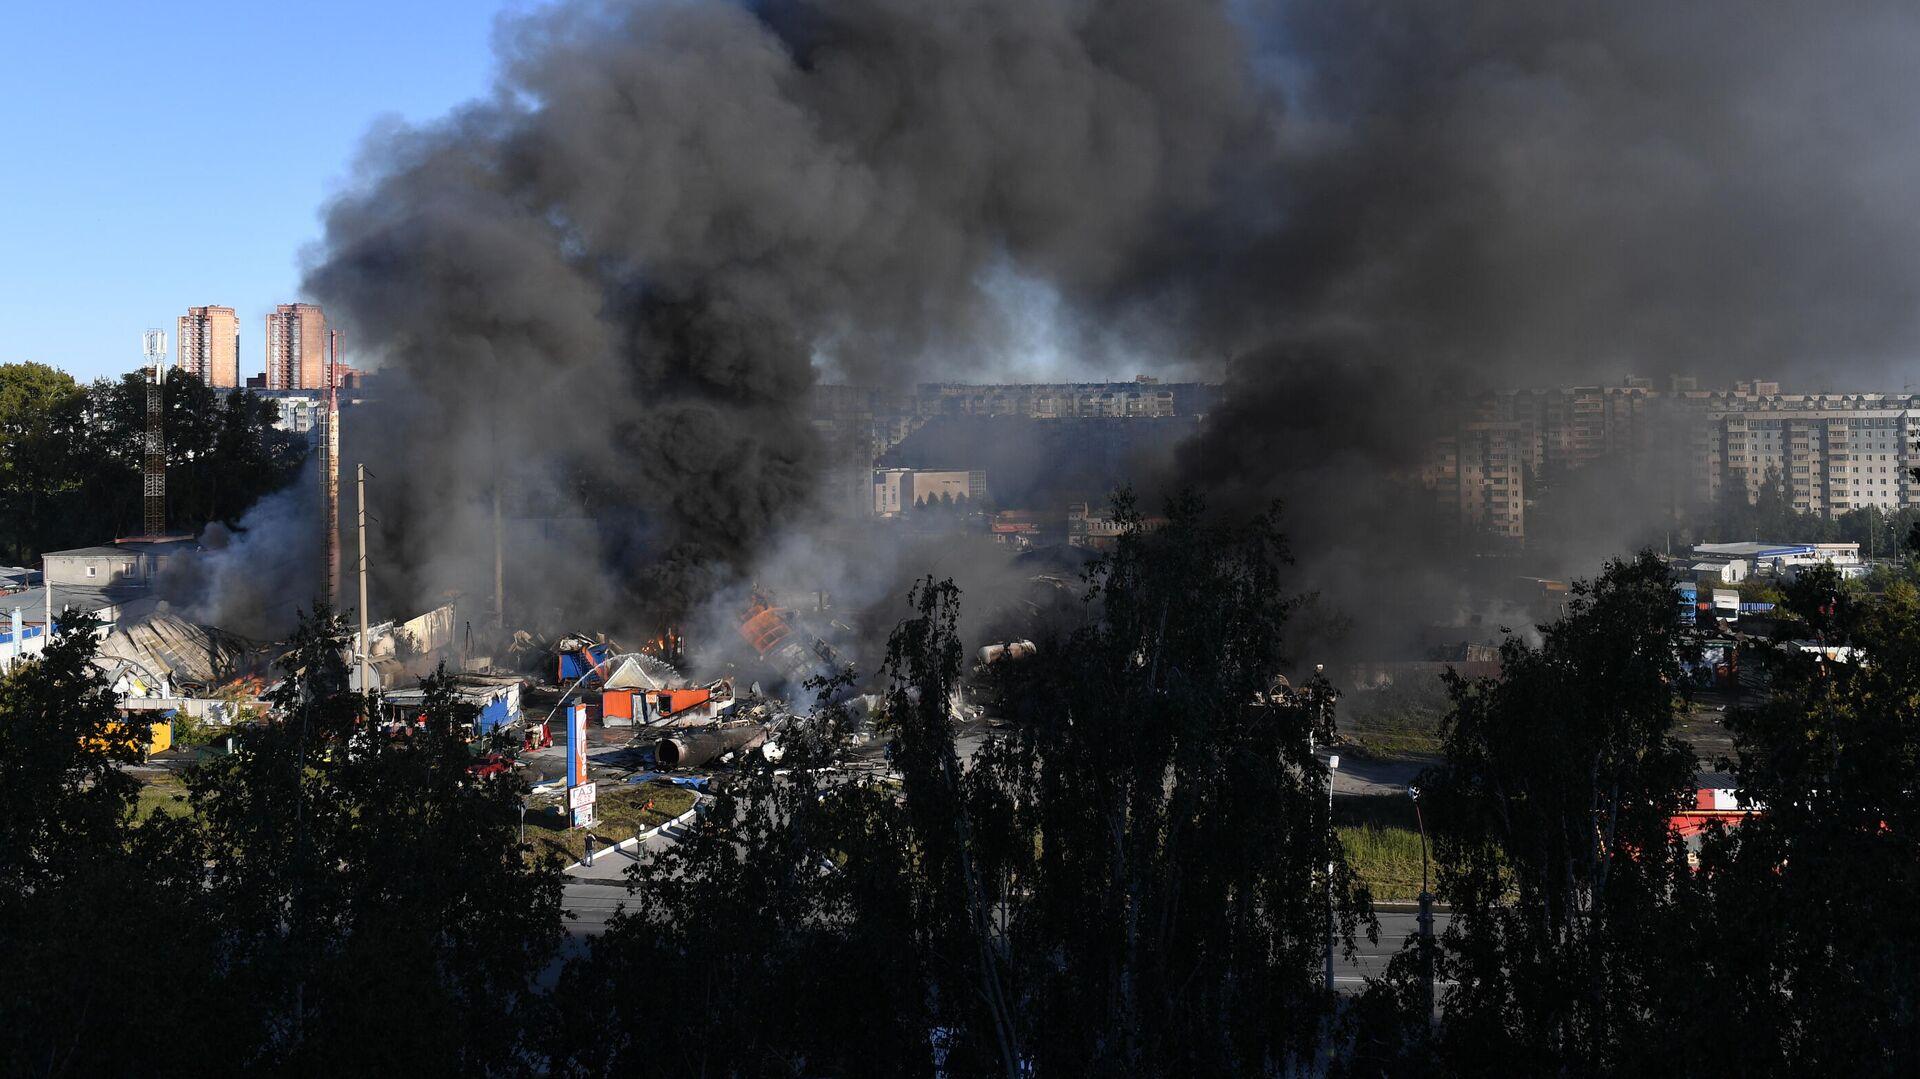 Автозаправка горит в Новосибирске - РИА Новости, 1920, 14.06.2021